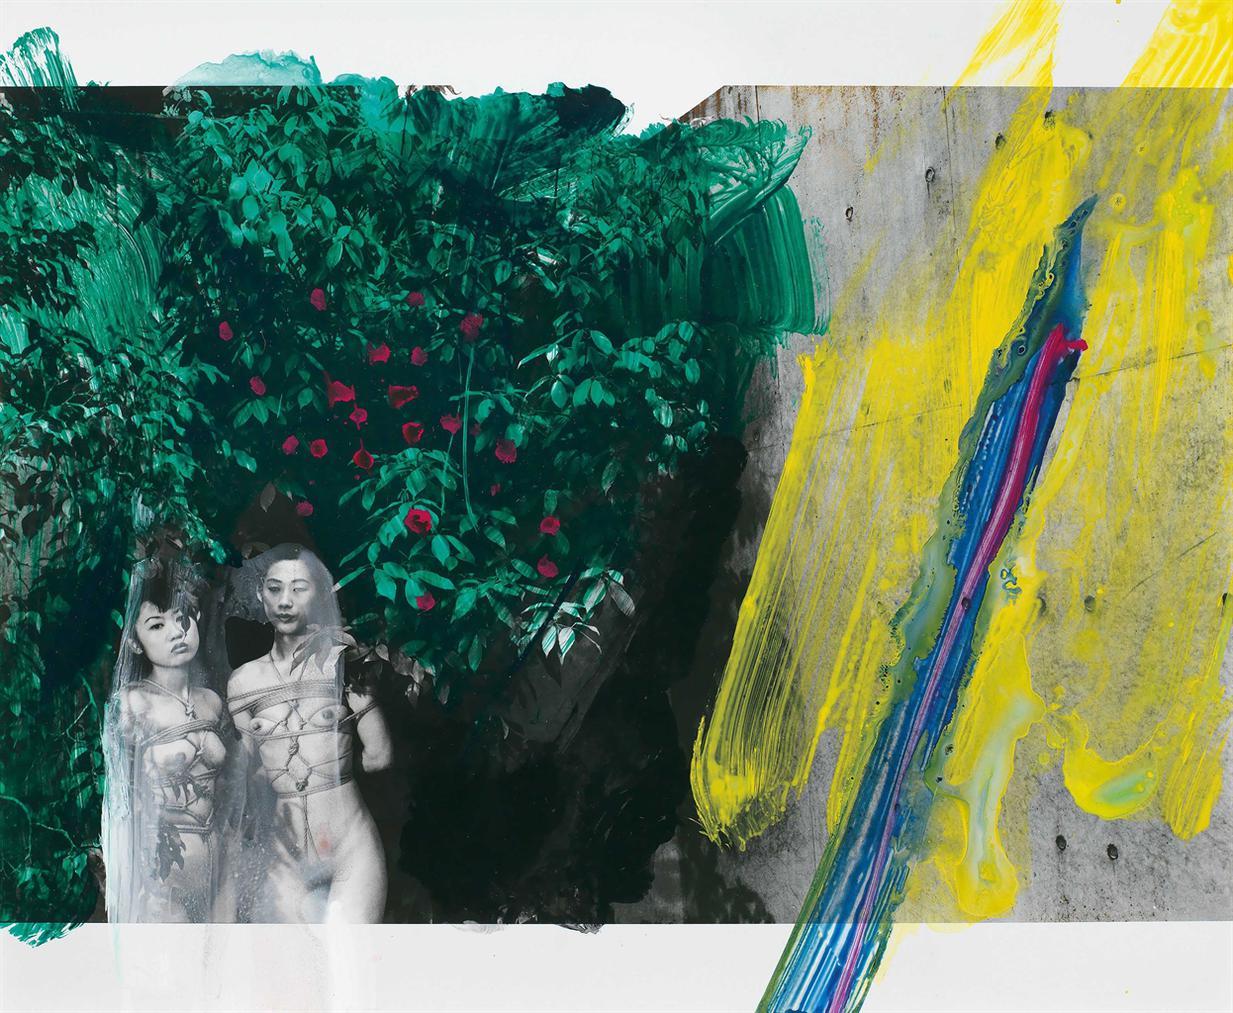 Nobuyoshi Araki-Shiki-In (Color Eros)-2005